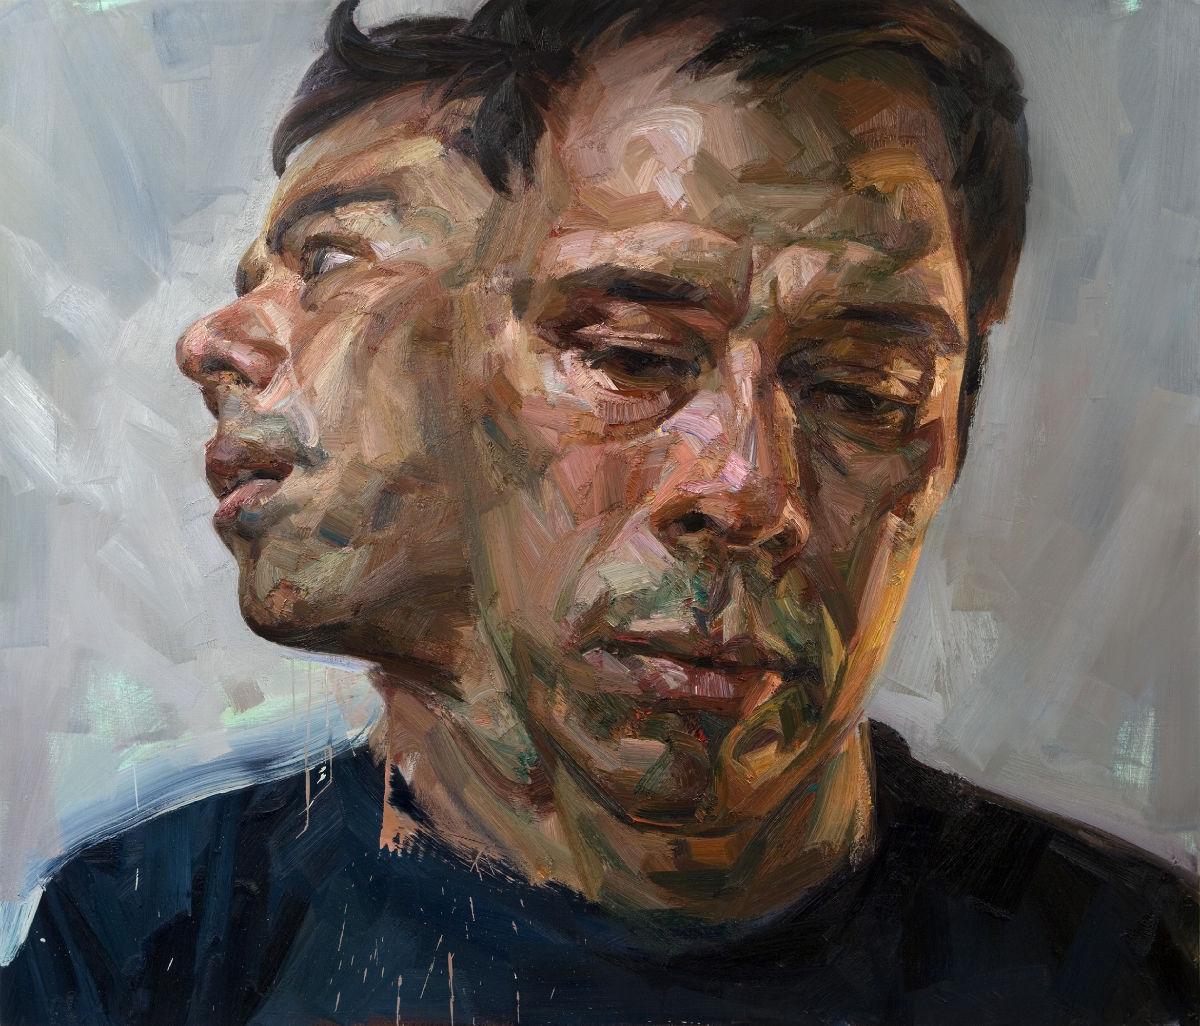 Tai Shan Schierenberg : Selfportrait as Janus  Tai Shan Schier...